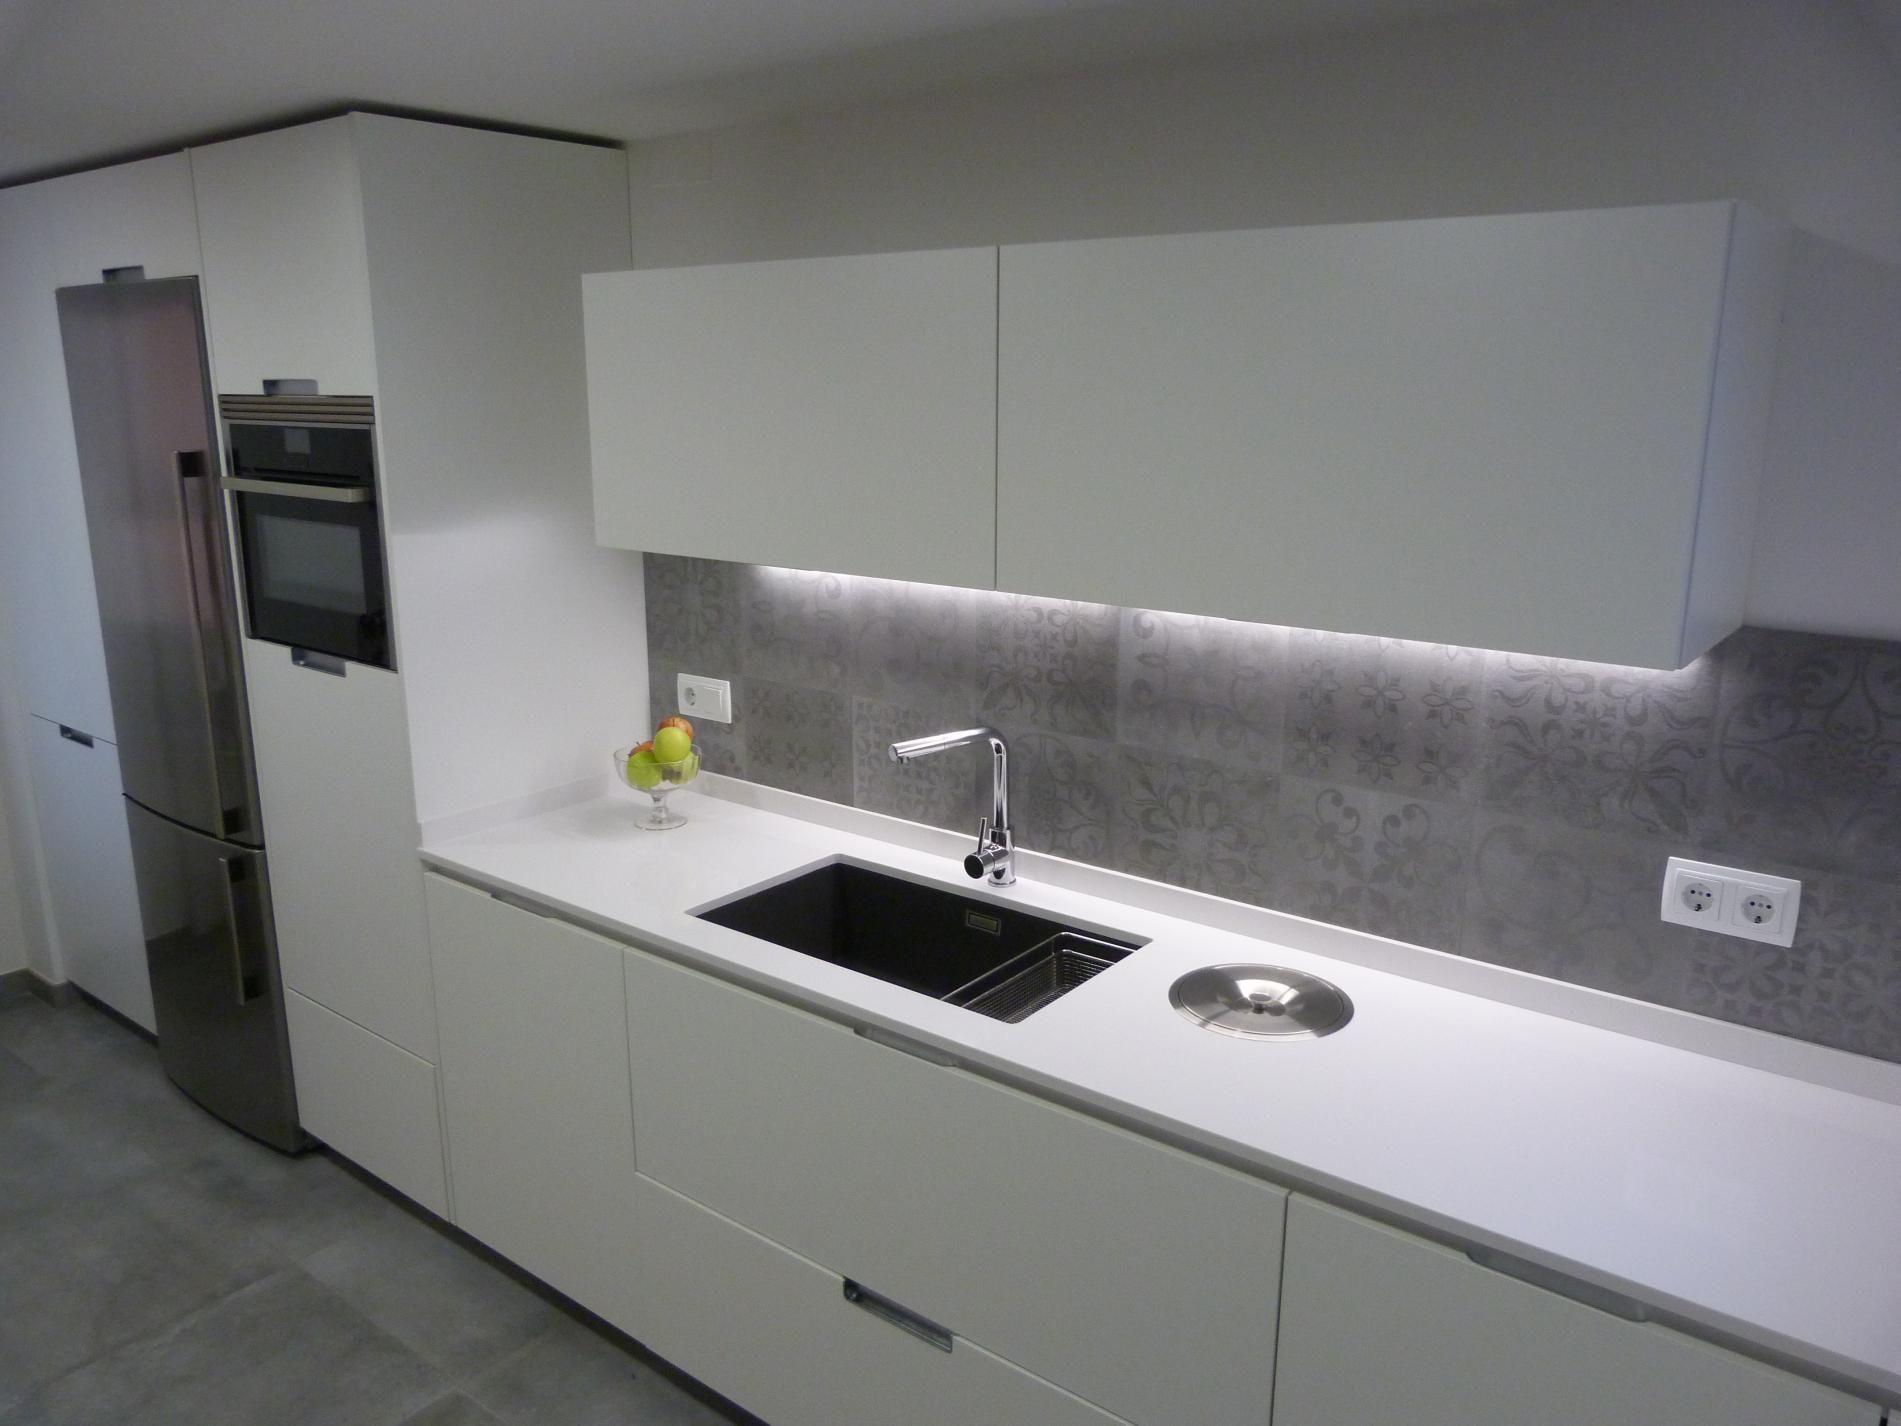 Pin de renova interiors en cocinas proyectos realizados - Cocinas blancas ...